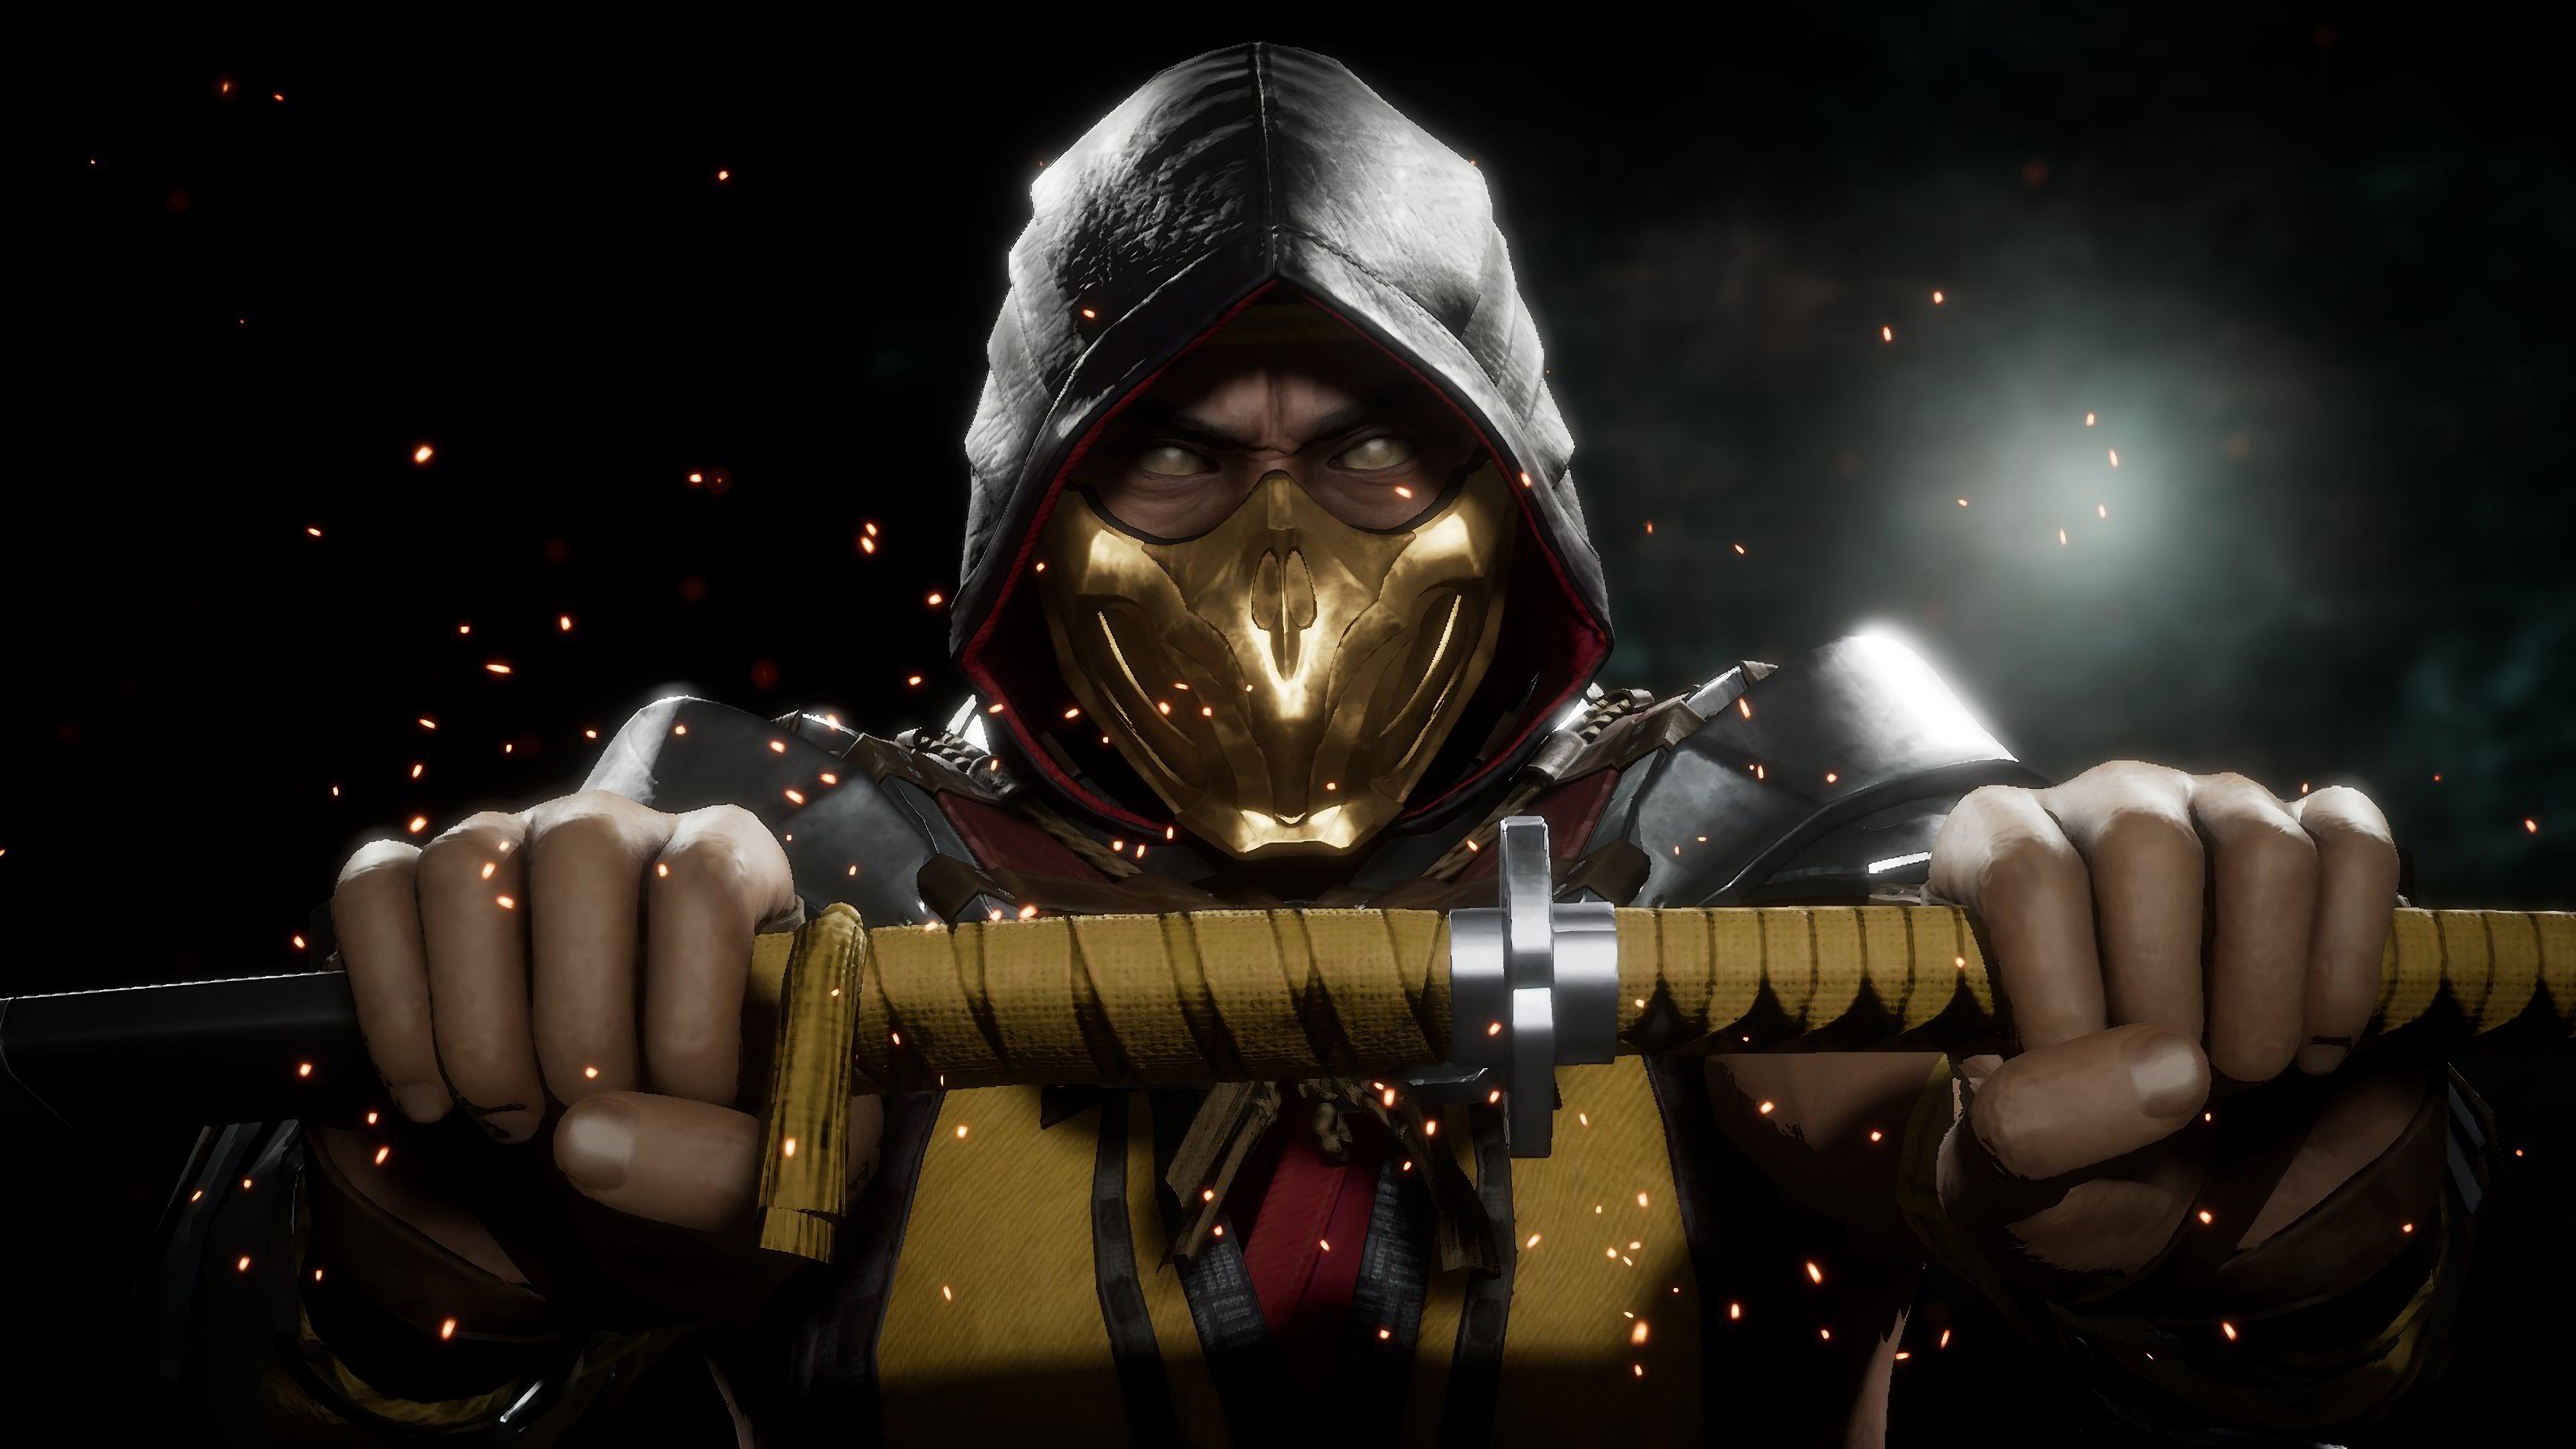 Mortal Kombat Scorpion 4k Desktop Wallpapers Wallpaper Cave